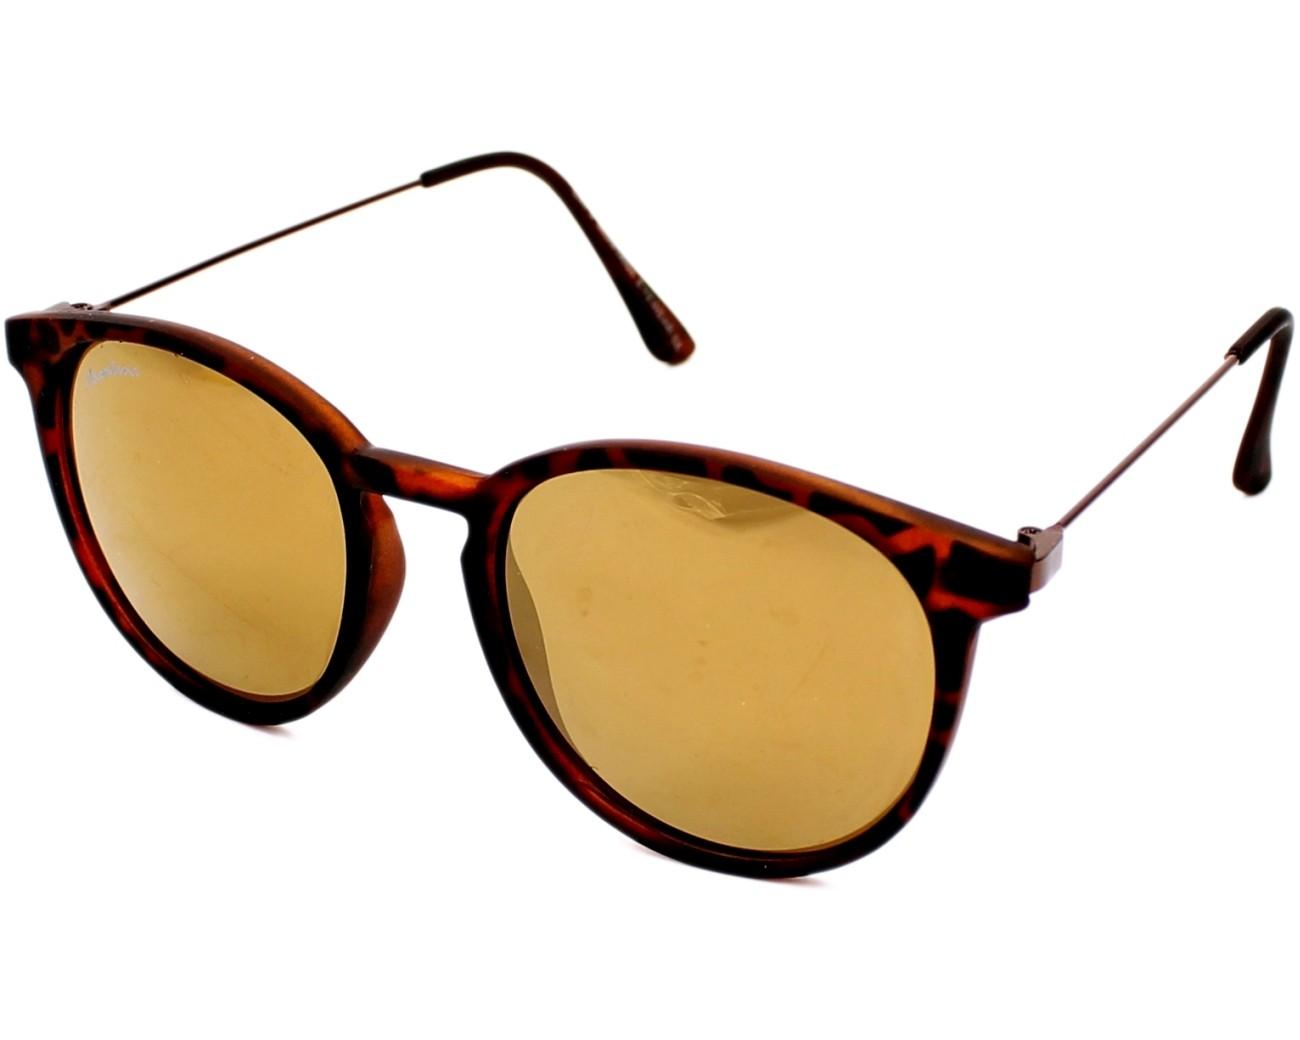 Montana Sunglasses Ms 33 D Havana Visionet